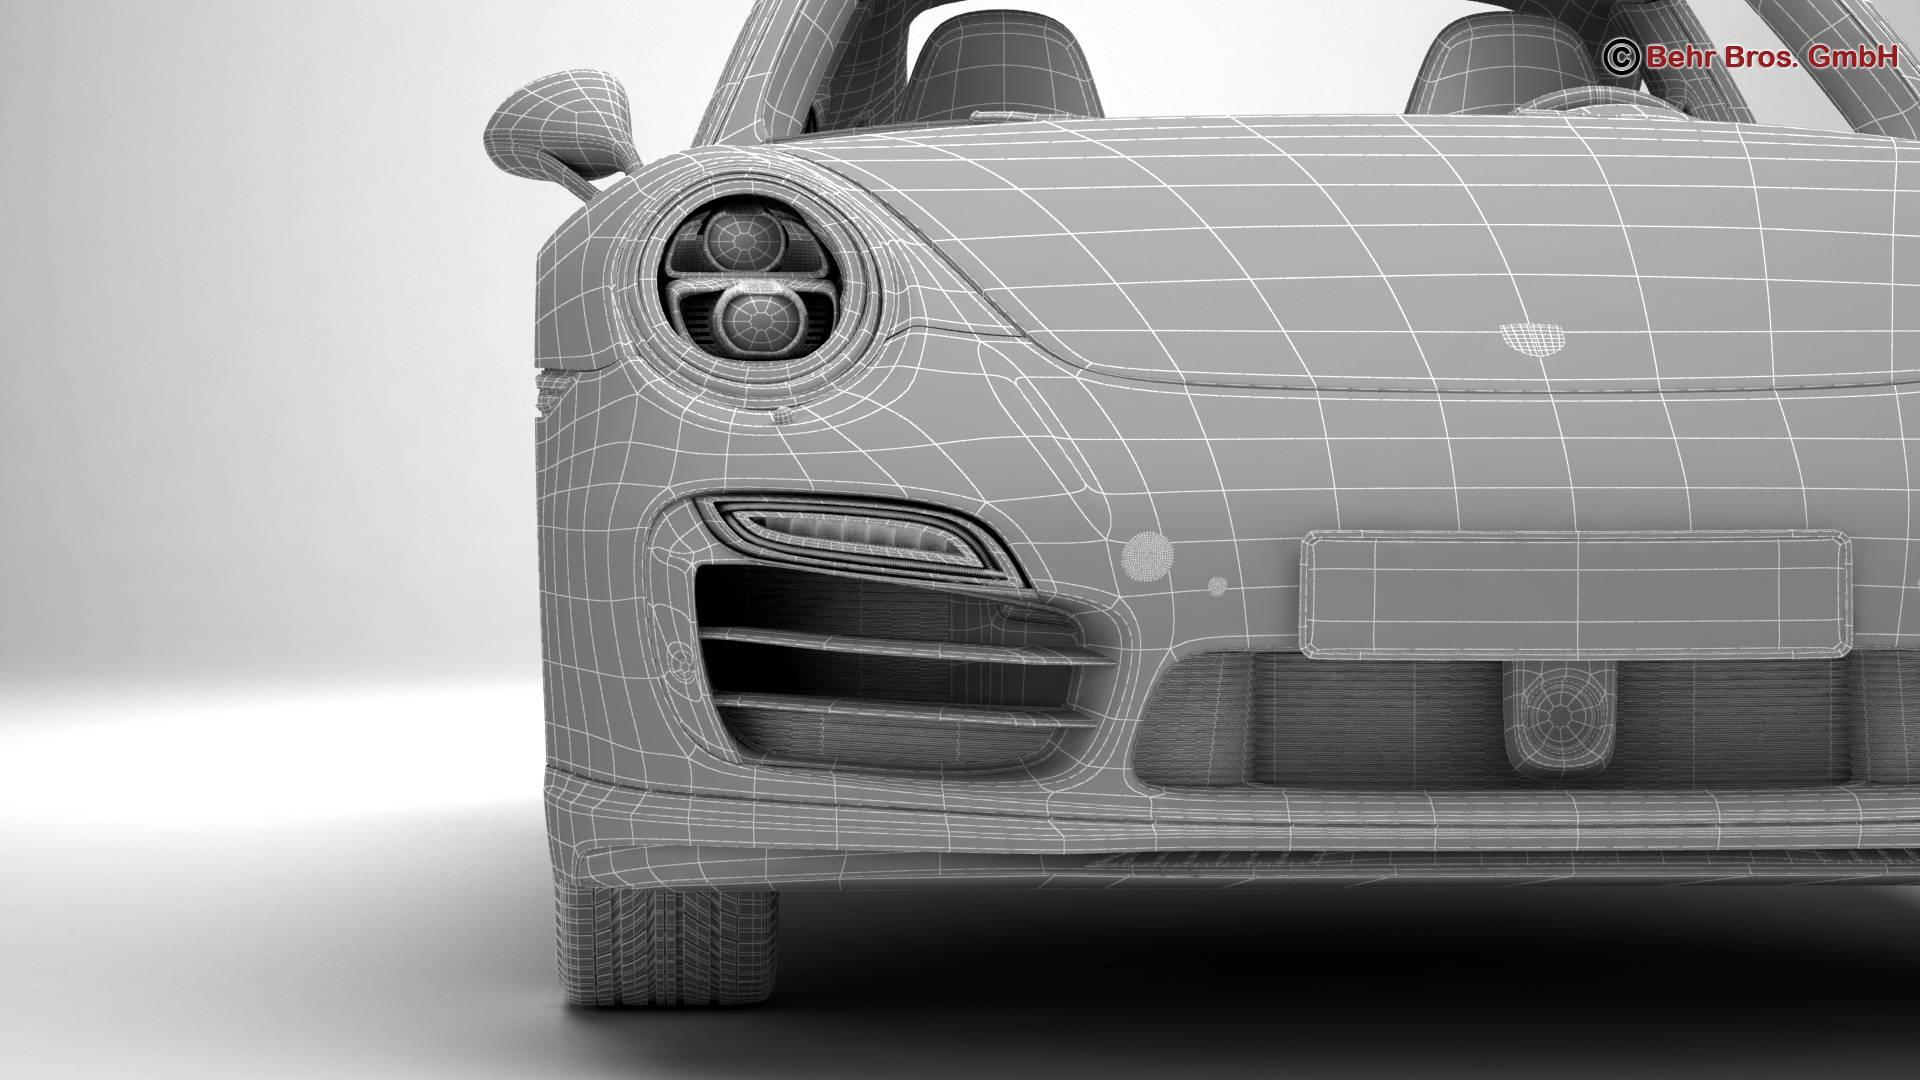 porsche 911 turbo s 2014 3d model 3ds max fbx c4d lwo ma mb obj 212497